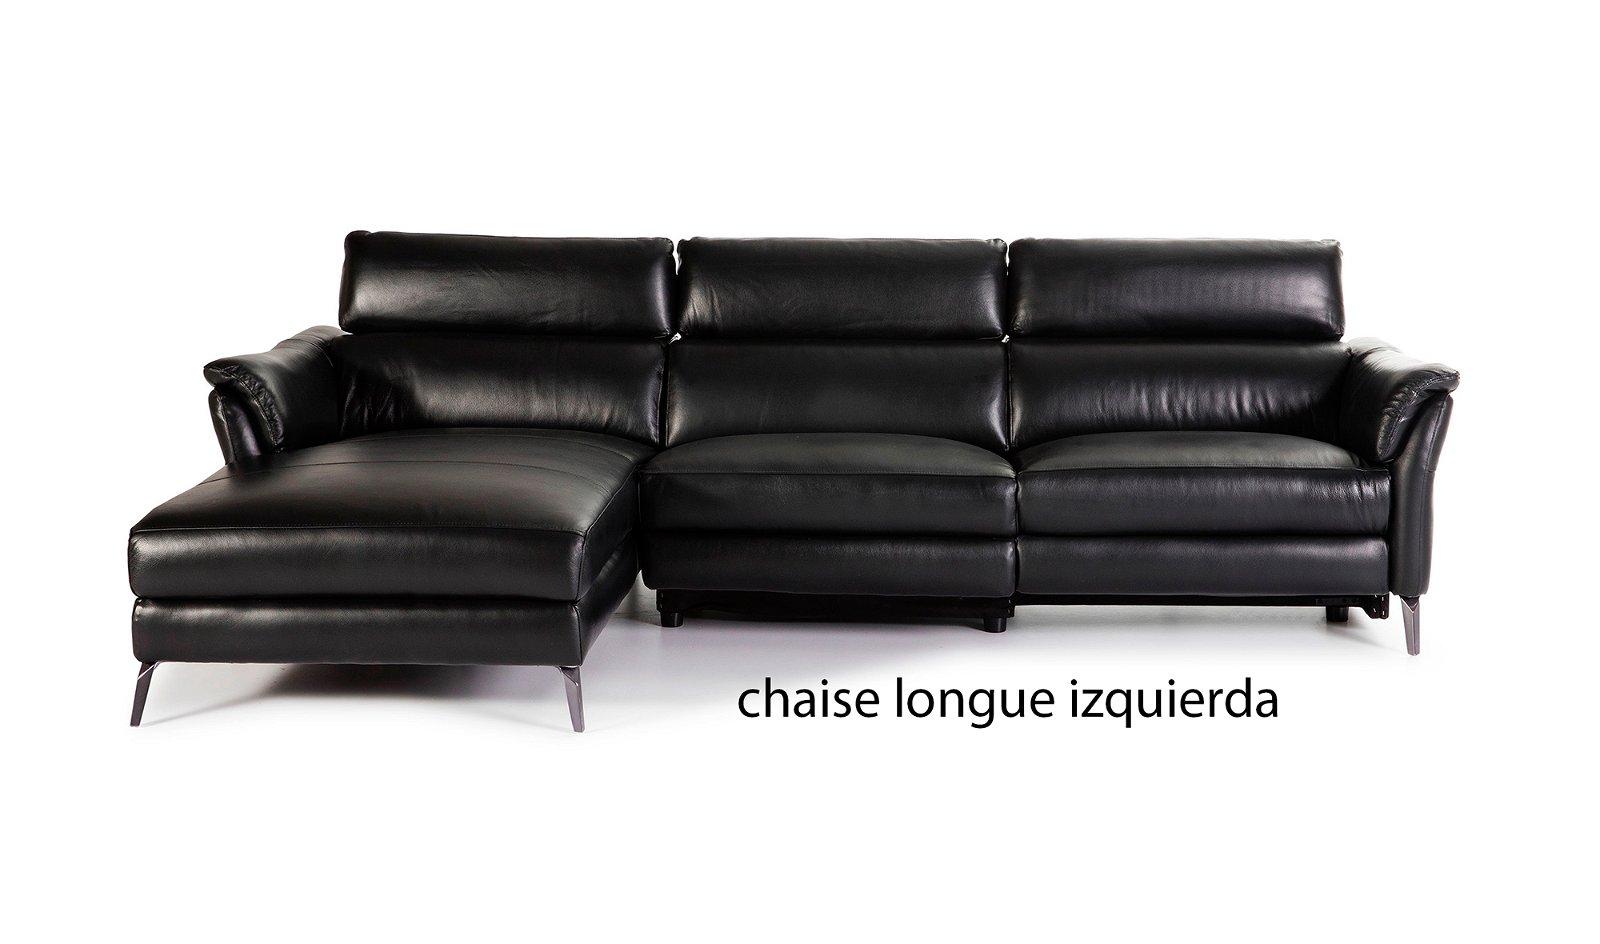 Sofá con chaise longue moderno piel y acero Tremezzina